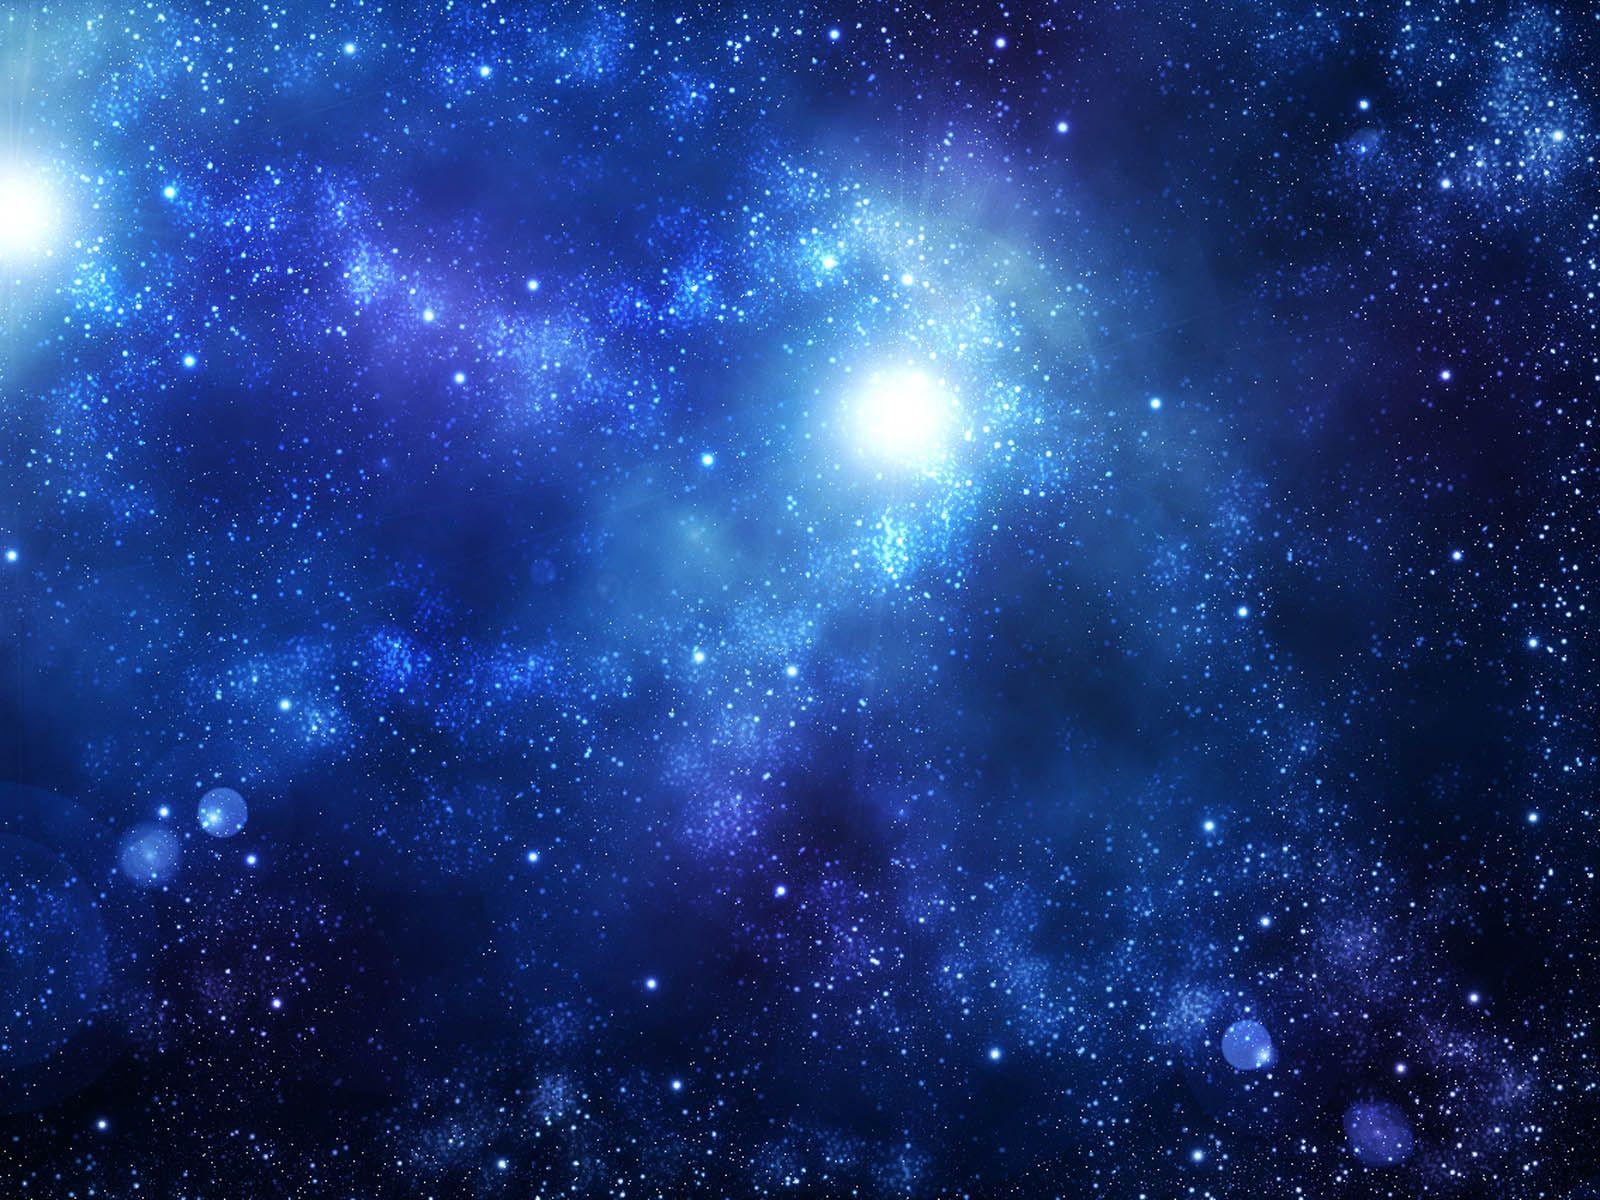 Blue Galaxy Background Apple Galaxy Wallpaper Blue Galaxy Wallpaper Galaxy Wallpaper